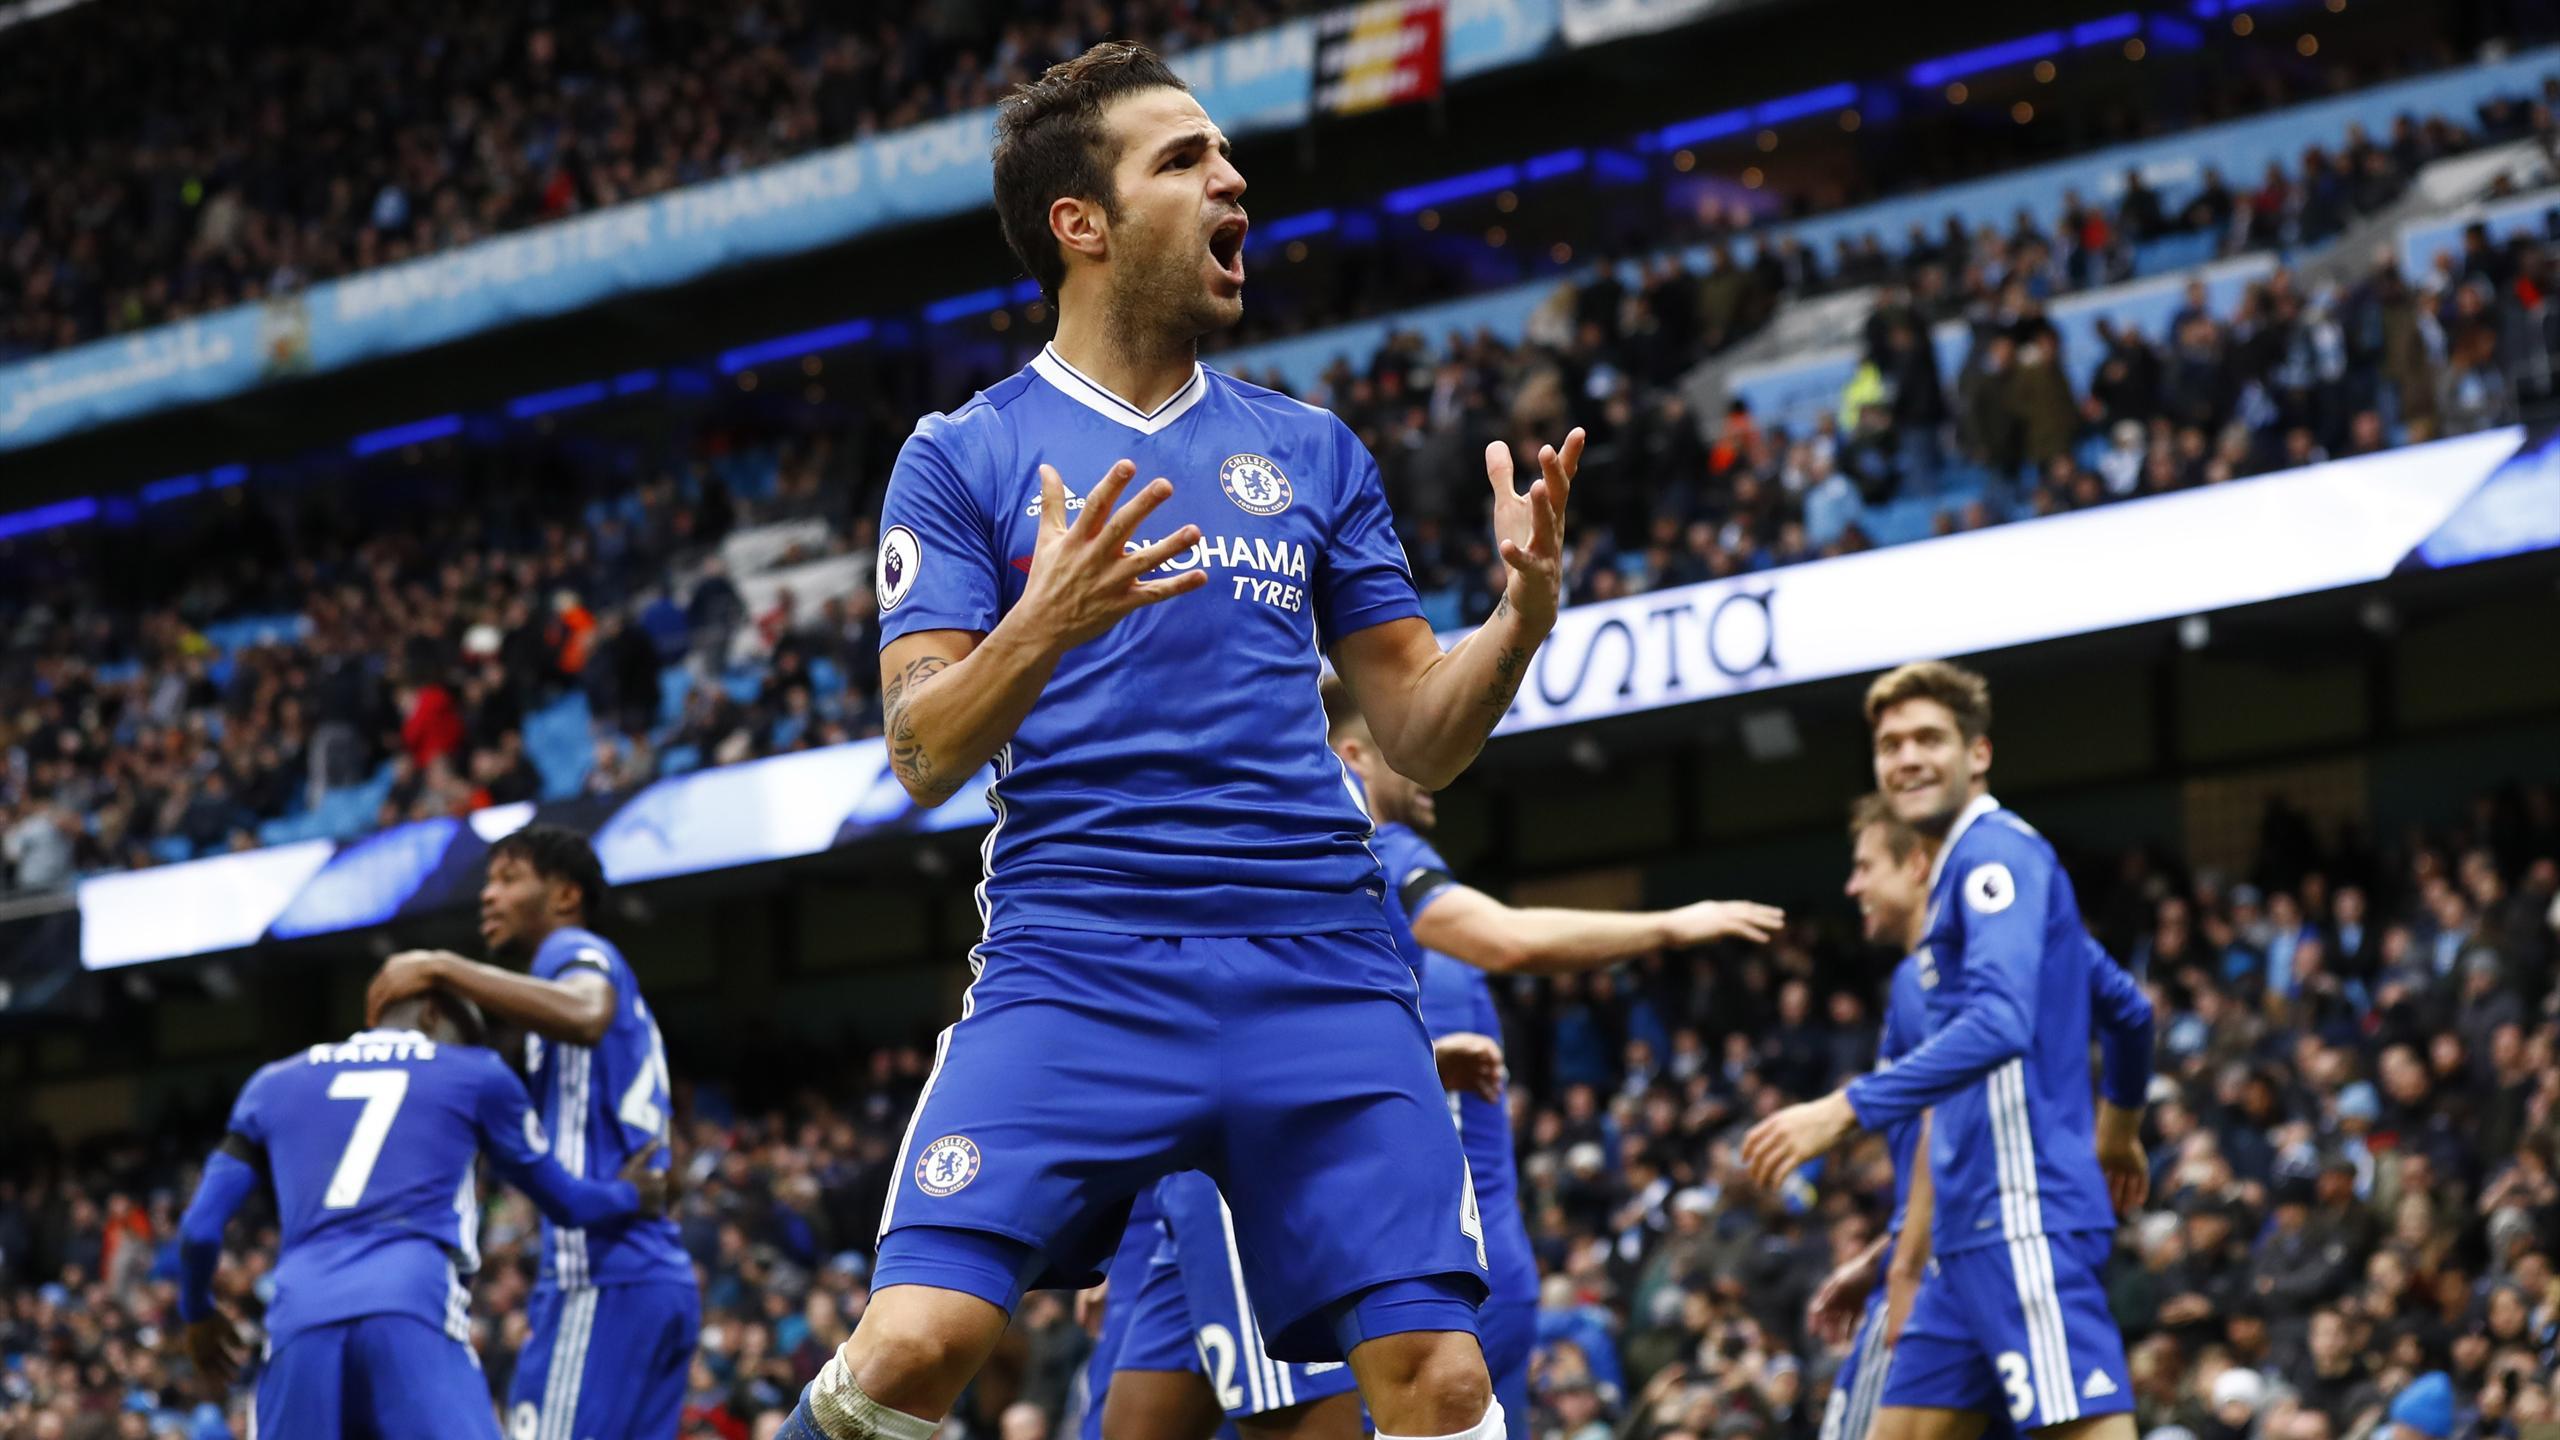 Cesc Fabregas celebrates their third goal scored by Eden Hazard